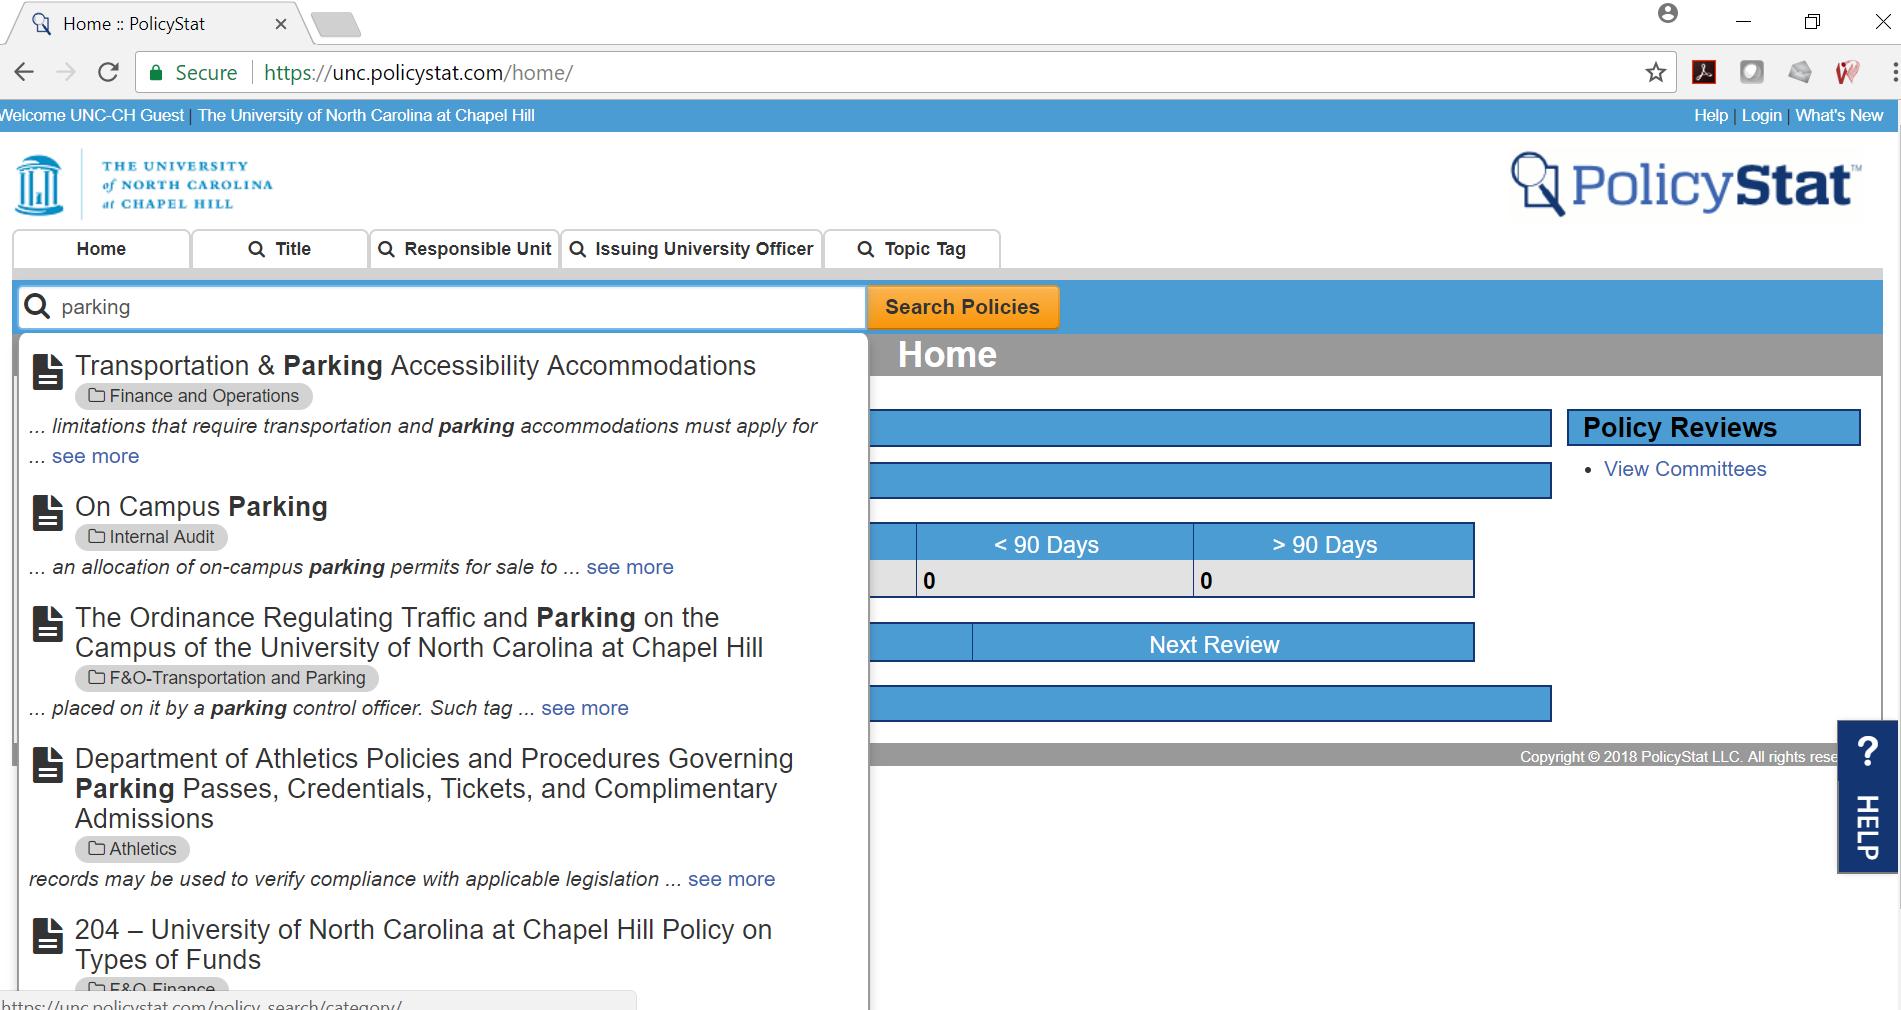 RLDatix Software - PolicyStat policy search screenshot